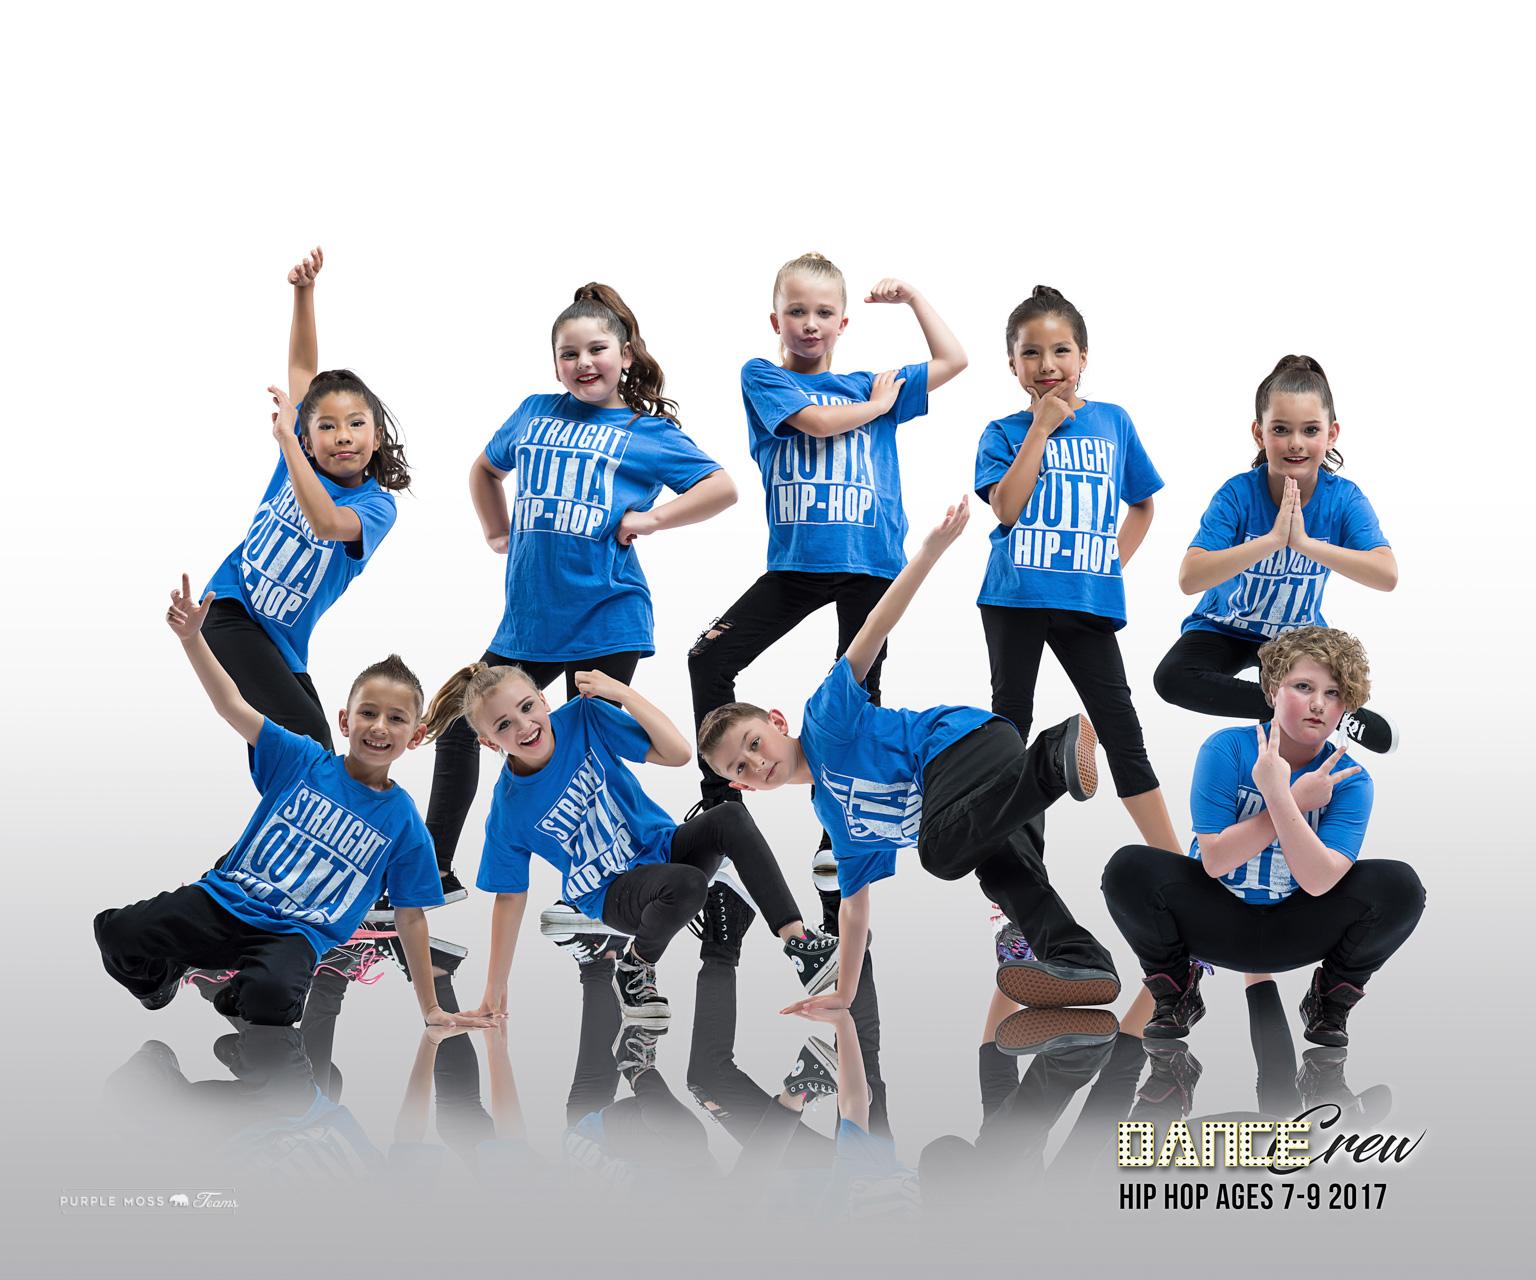 DCREW Hip-Hop 7-9 group